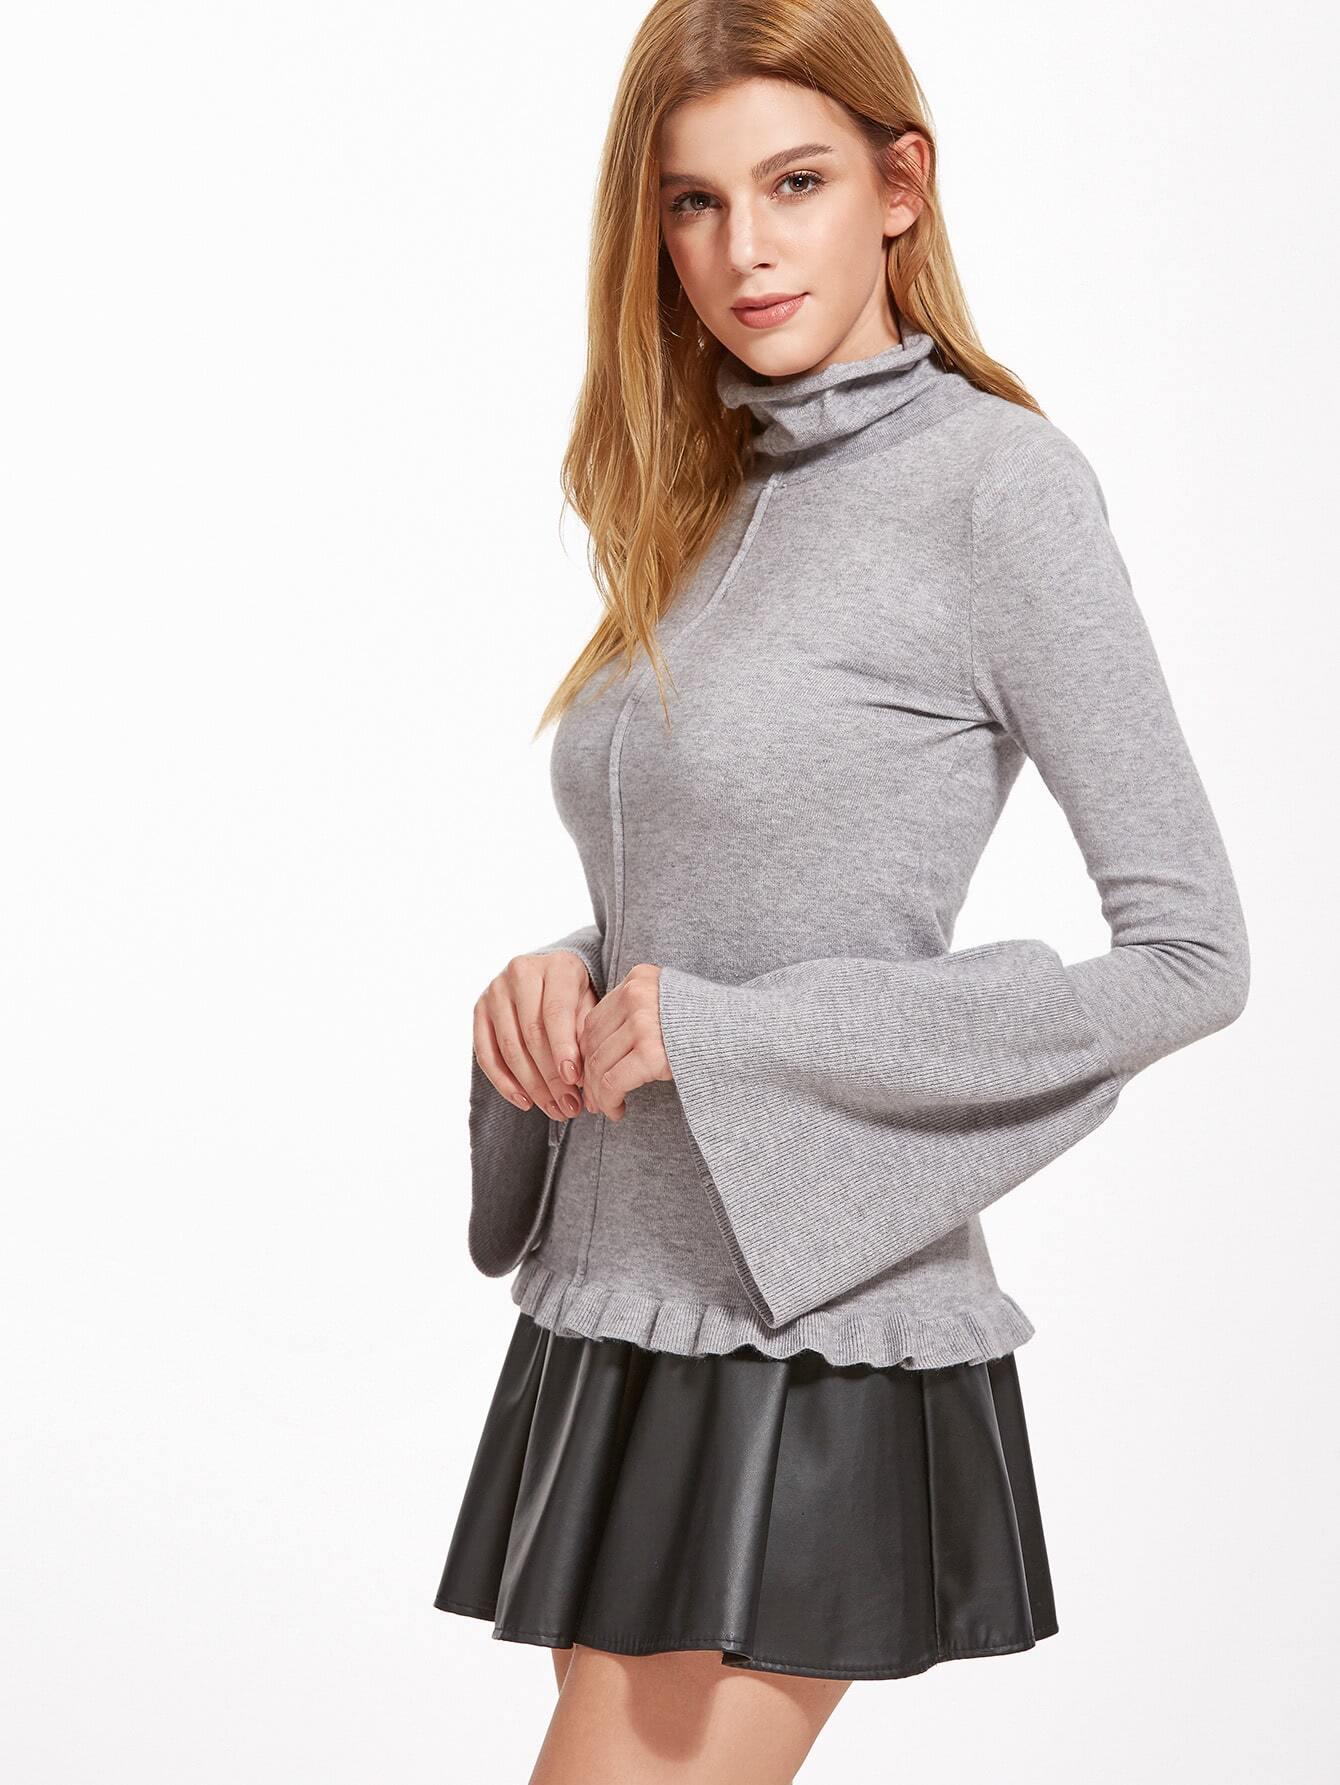 sweater160915463_2